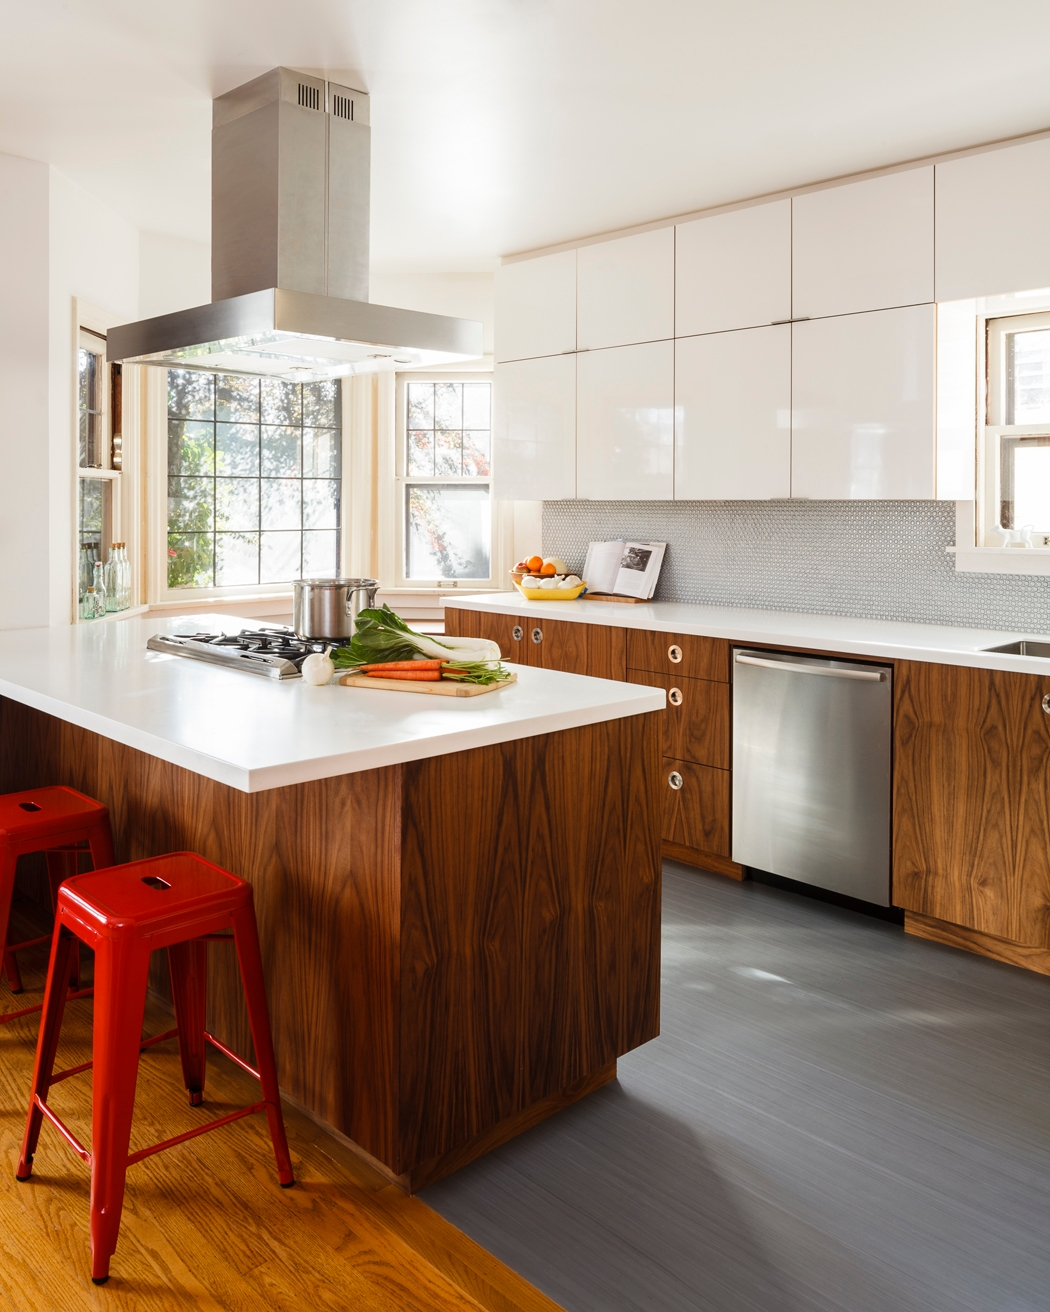 Kitchen remodel bath addition fsc certified cabinets for Certified kitchen cabinets